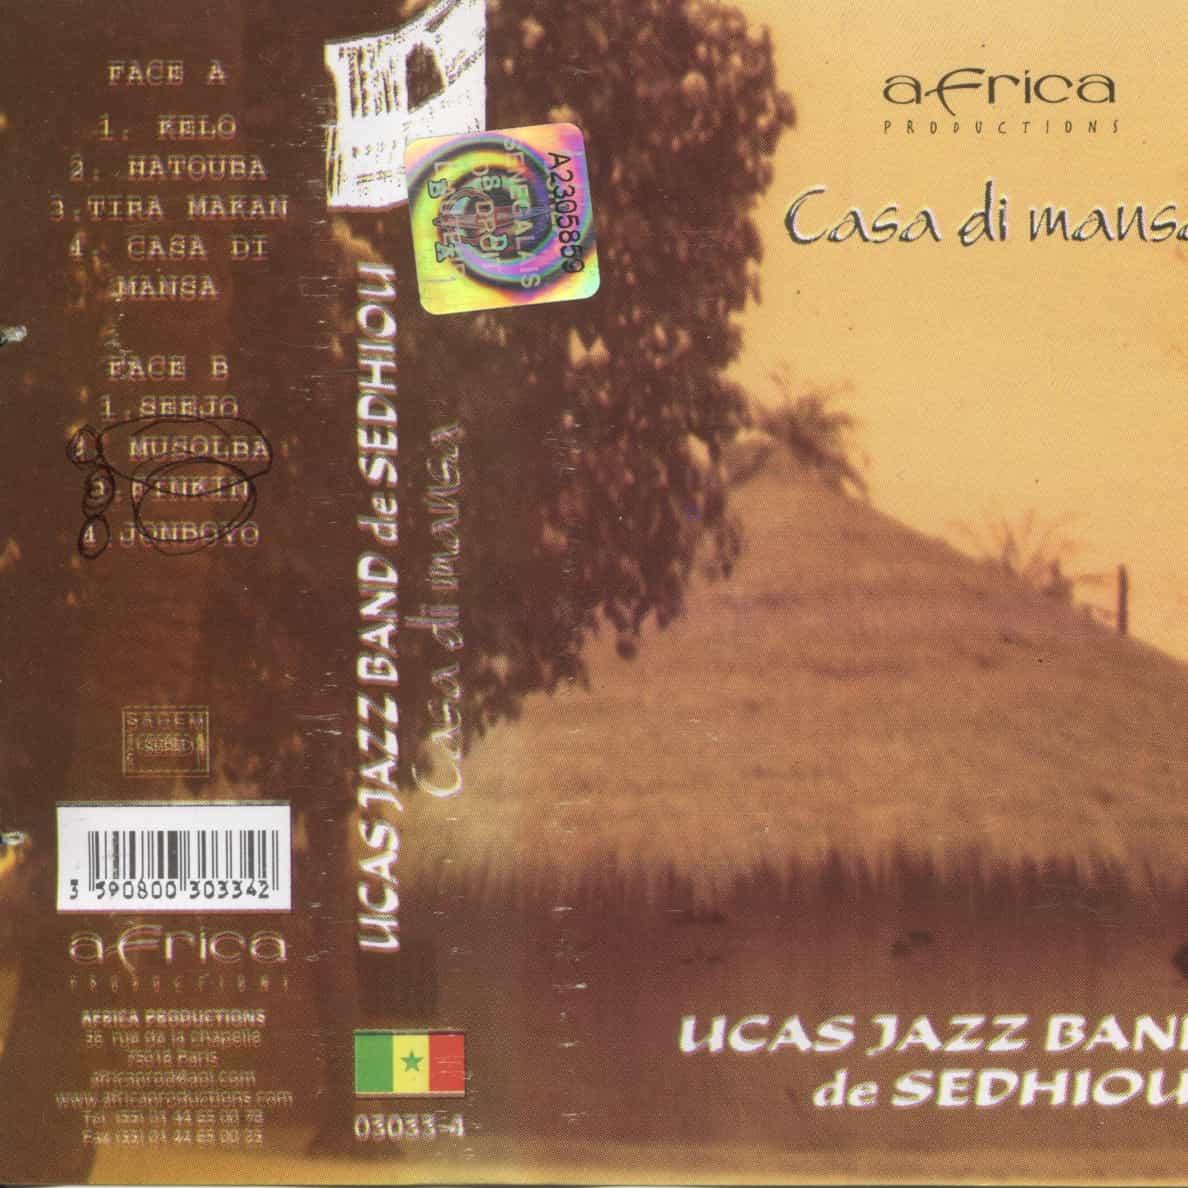 UCAS JazzBand Sedhiou Casamance